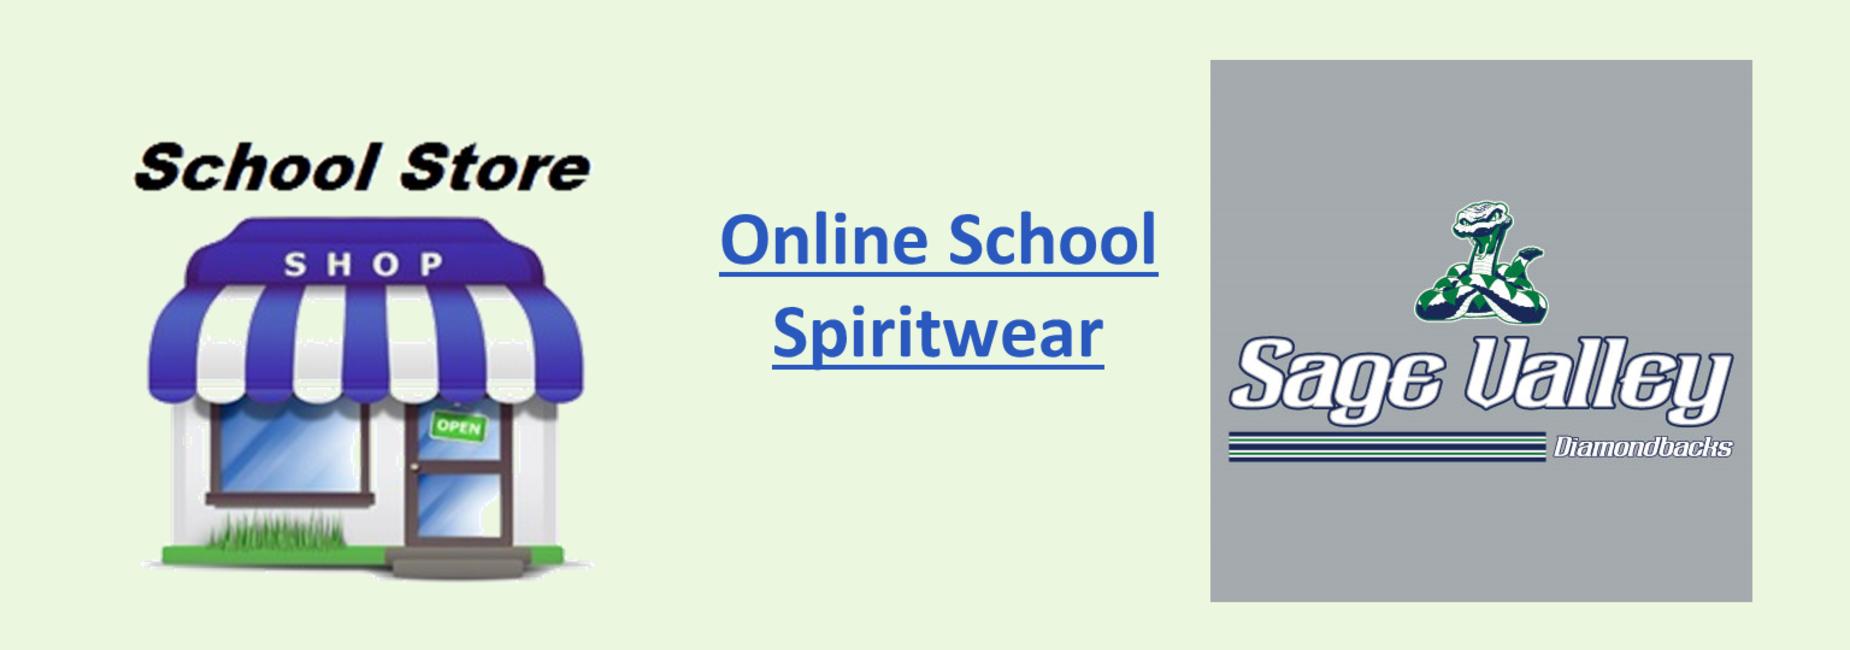 School Store Spiritwear